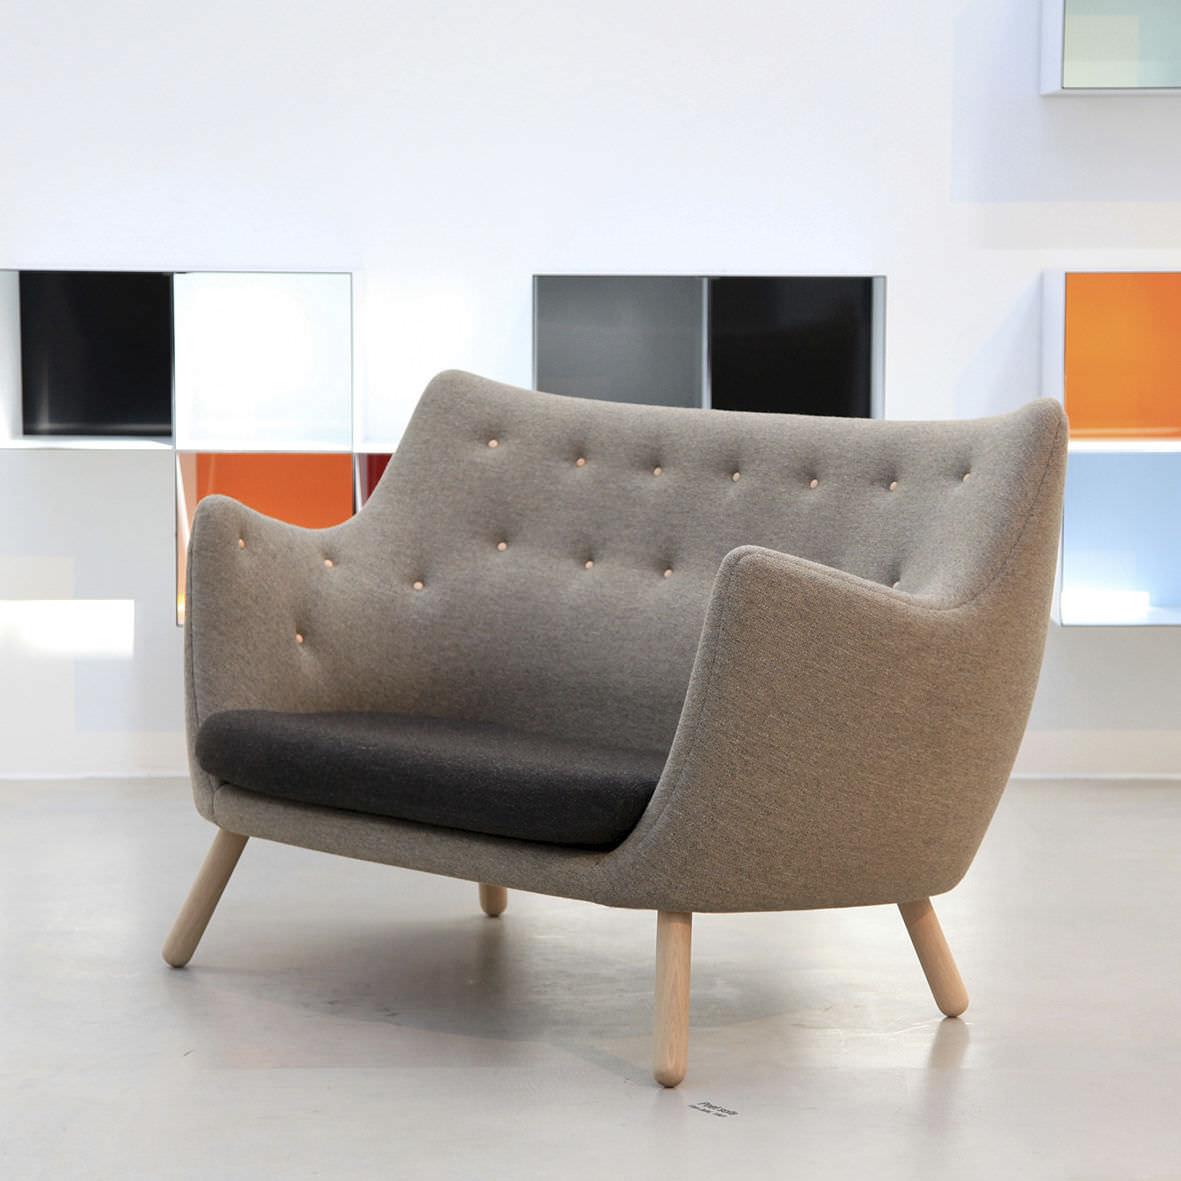 Sofa / Skandinavisches Design / Holz / Stoff / Von Finn Juhl   POET